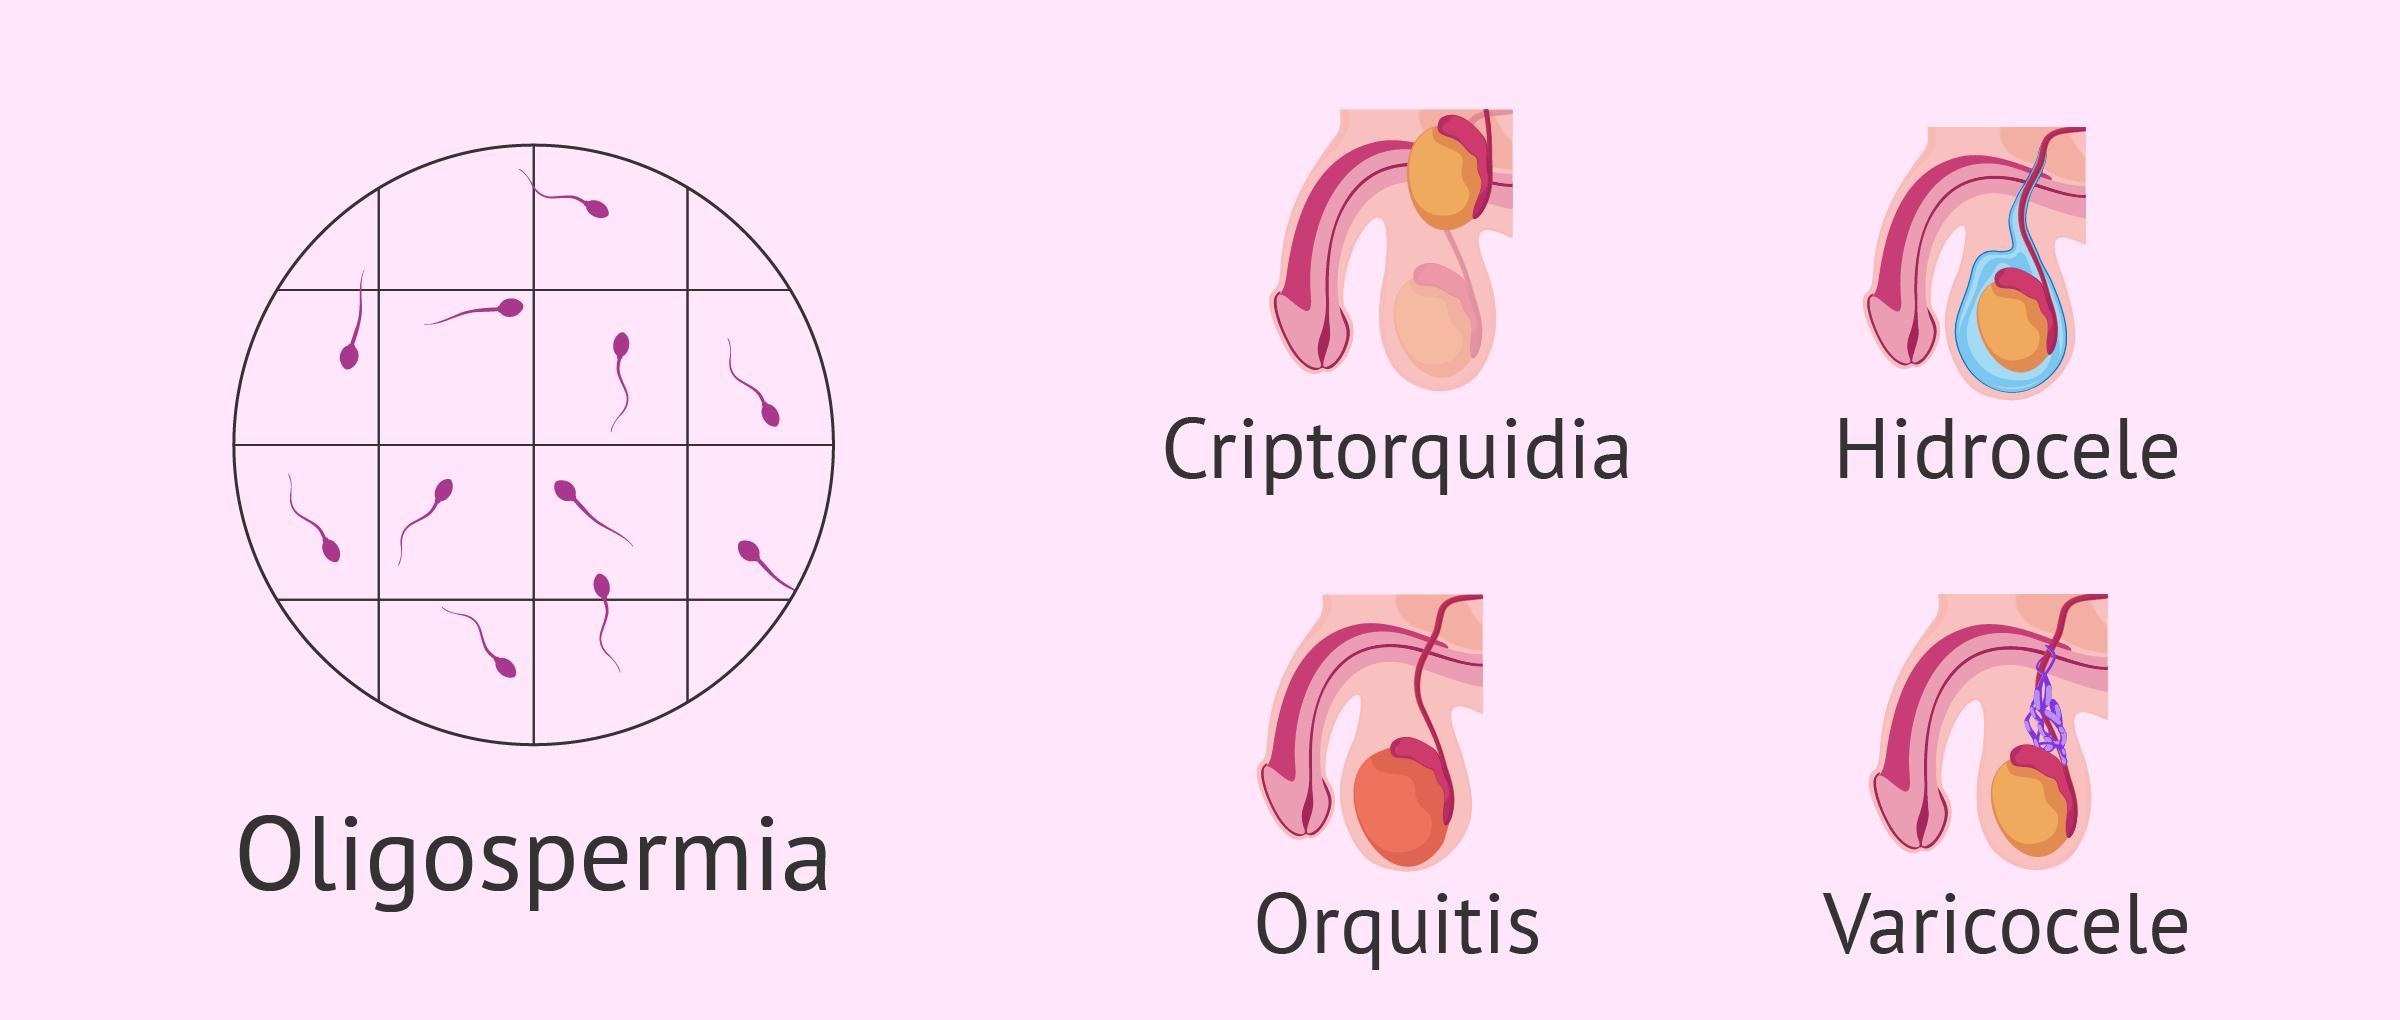 Alteraciones asociadas a la oligospermia e infertilidad masculina